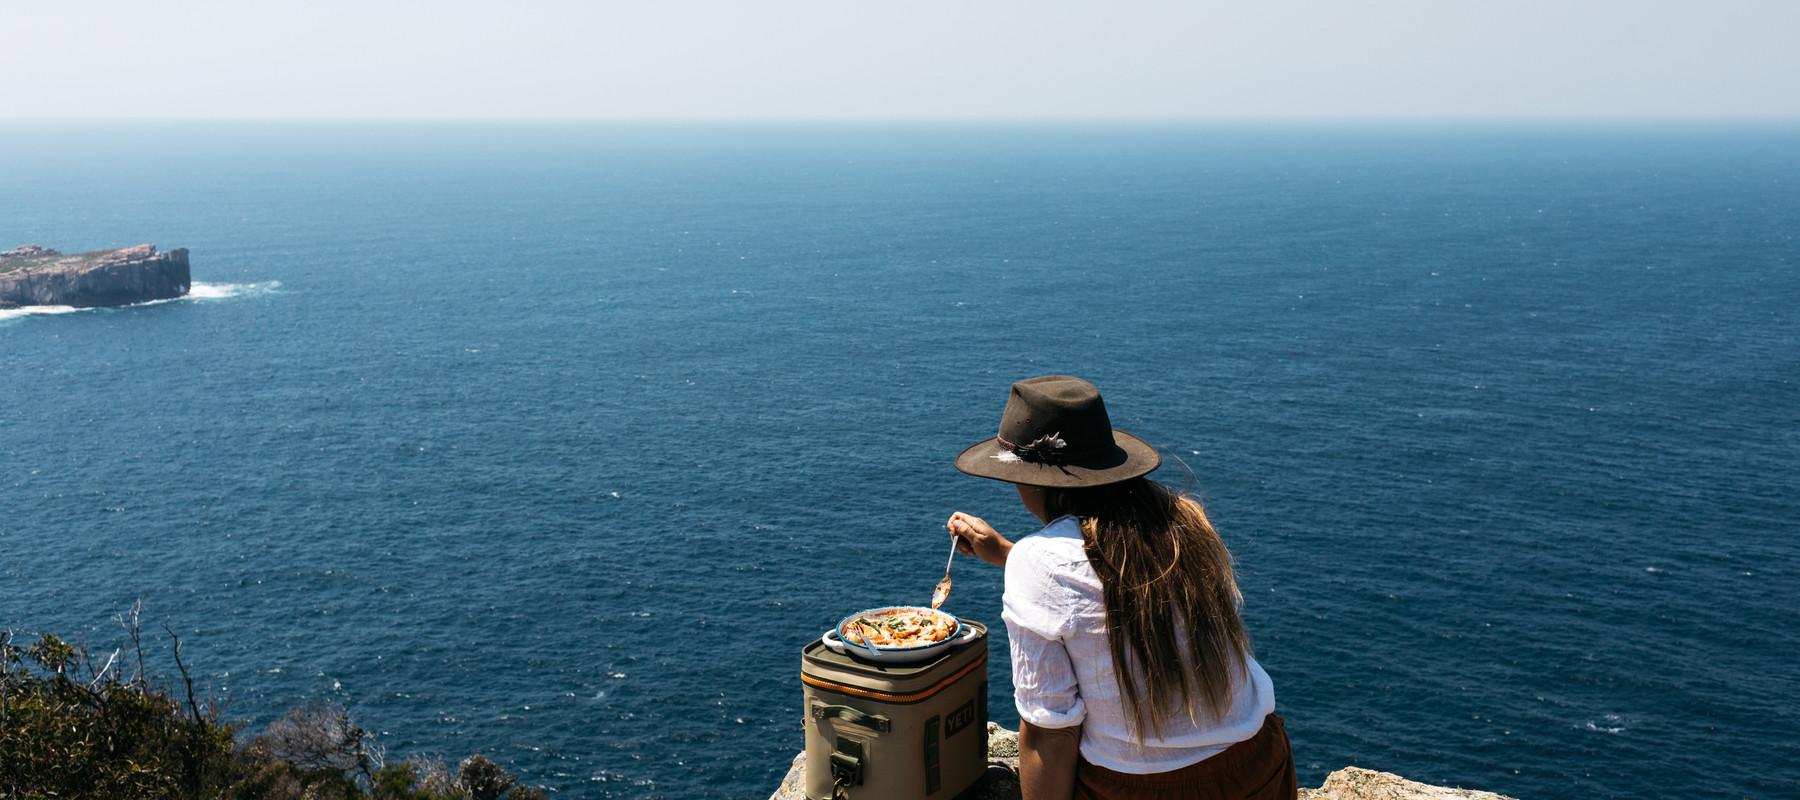 8b75ad68b6261c6b40c93414fb4c479fde7b3e08_recipe-food-basil-ricotta-pasta-shells-eating-sarah-glover-ocean.jpg